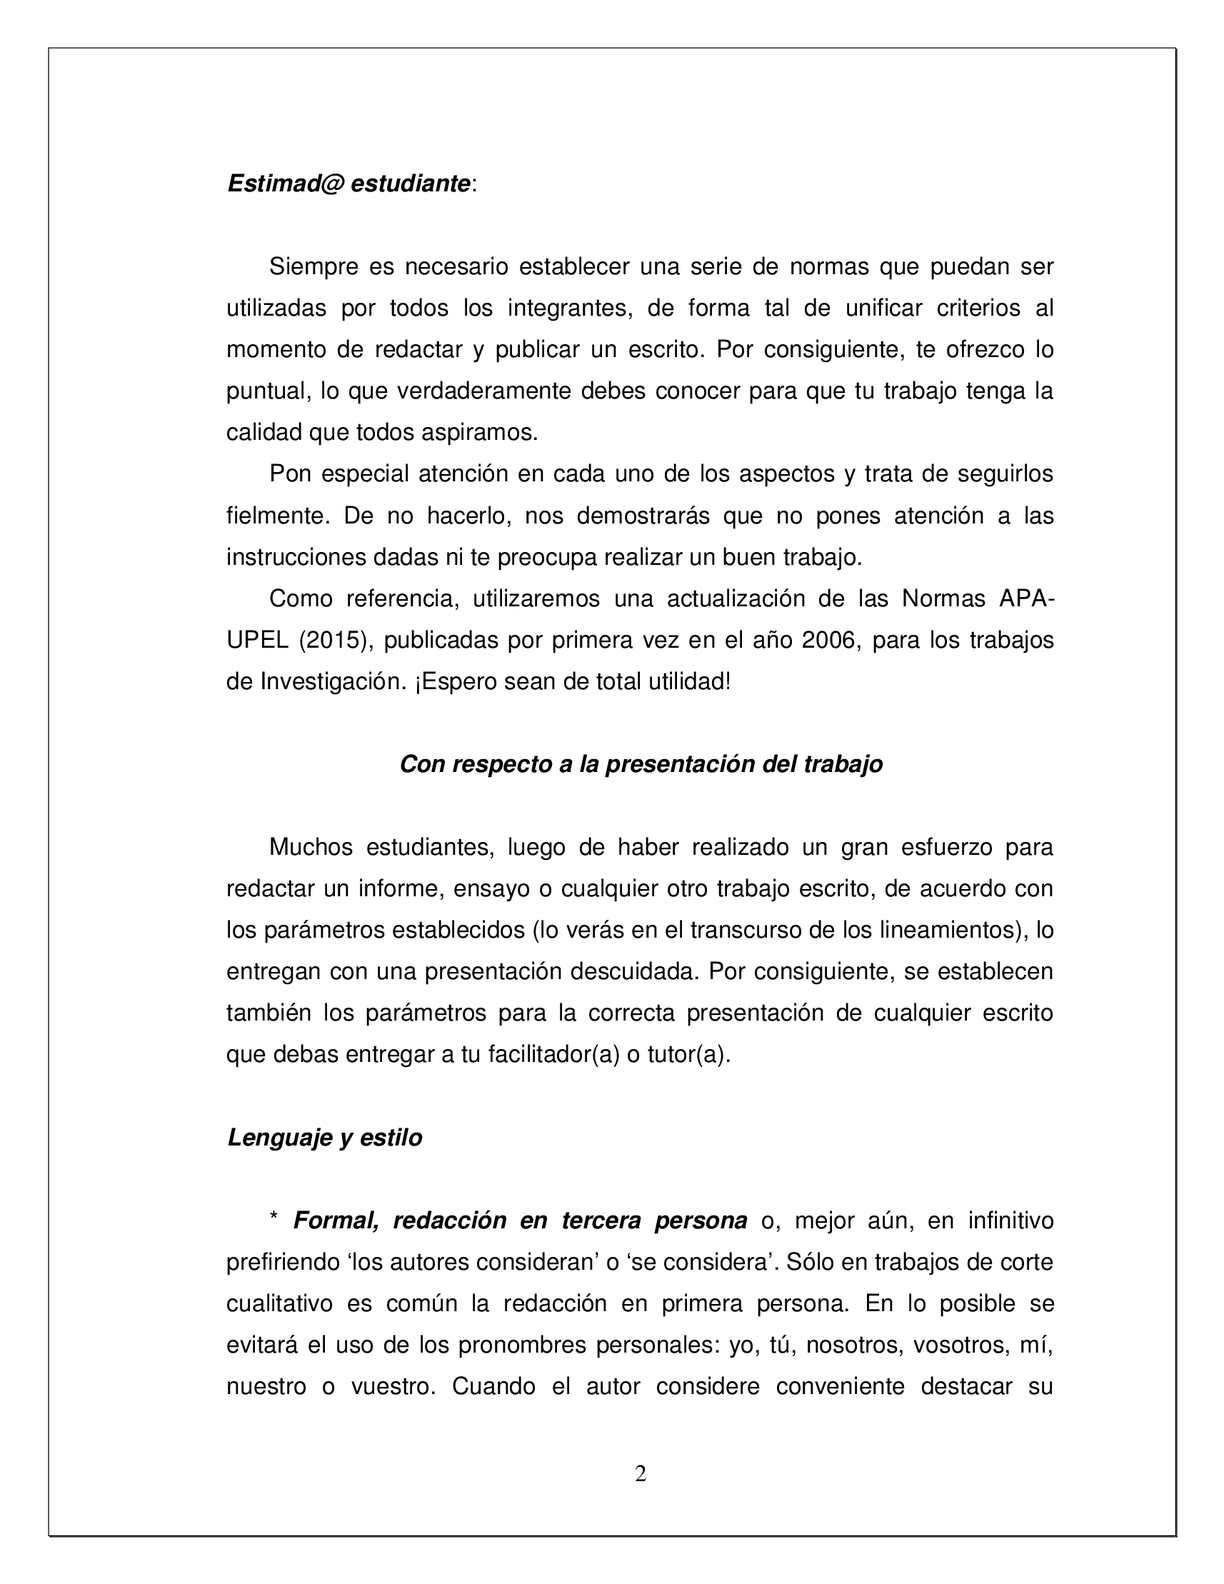 Normas Apa Upel 2015 CALAMEO Downloader